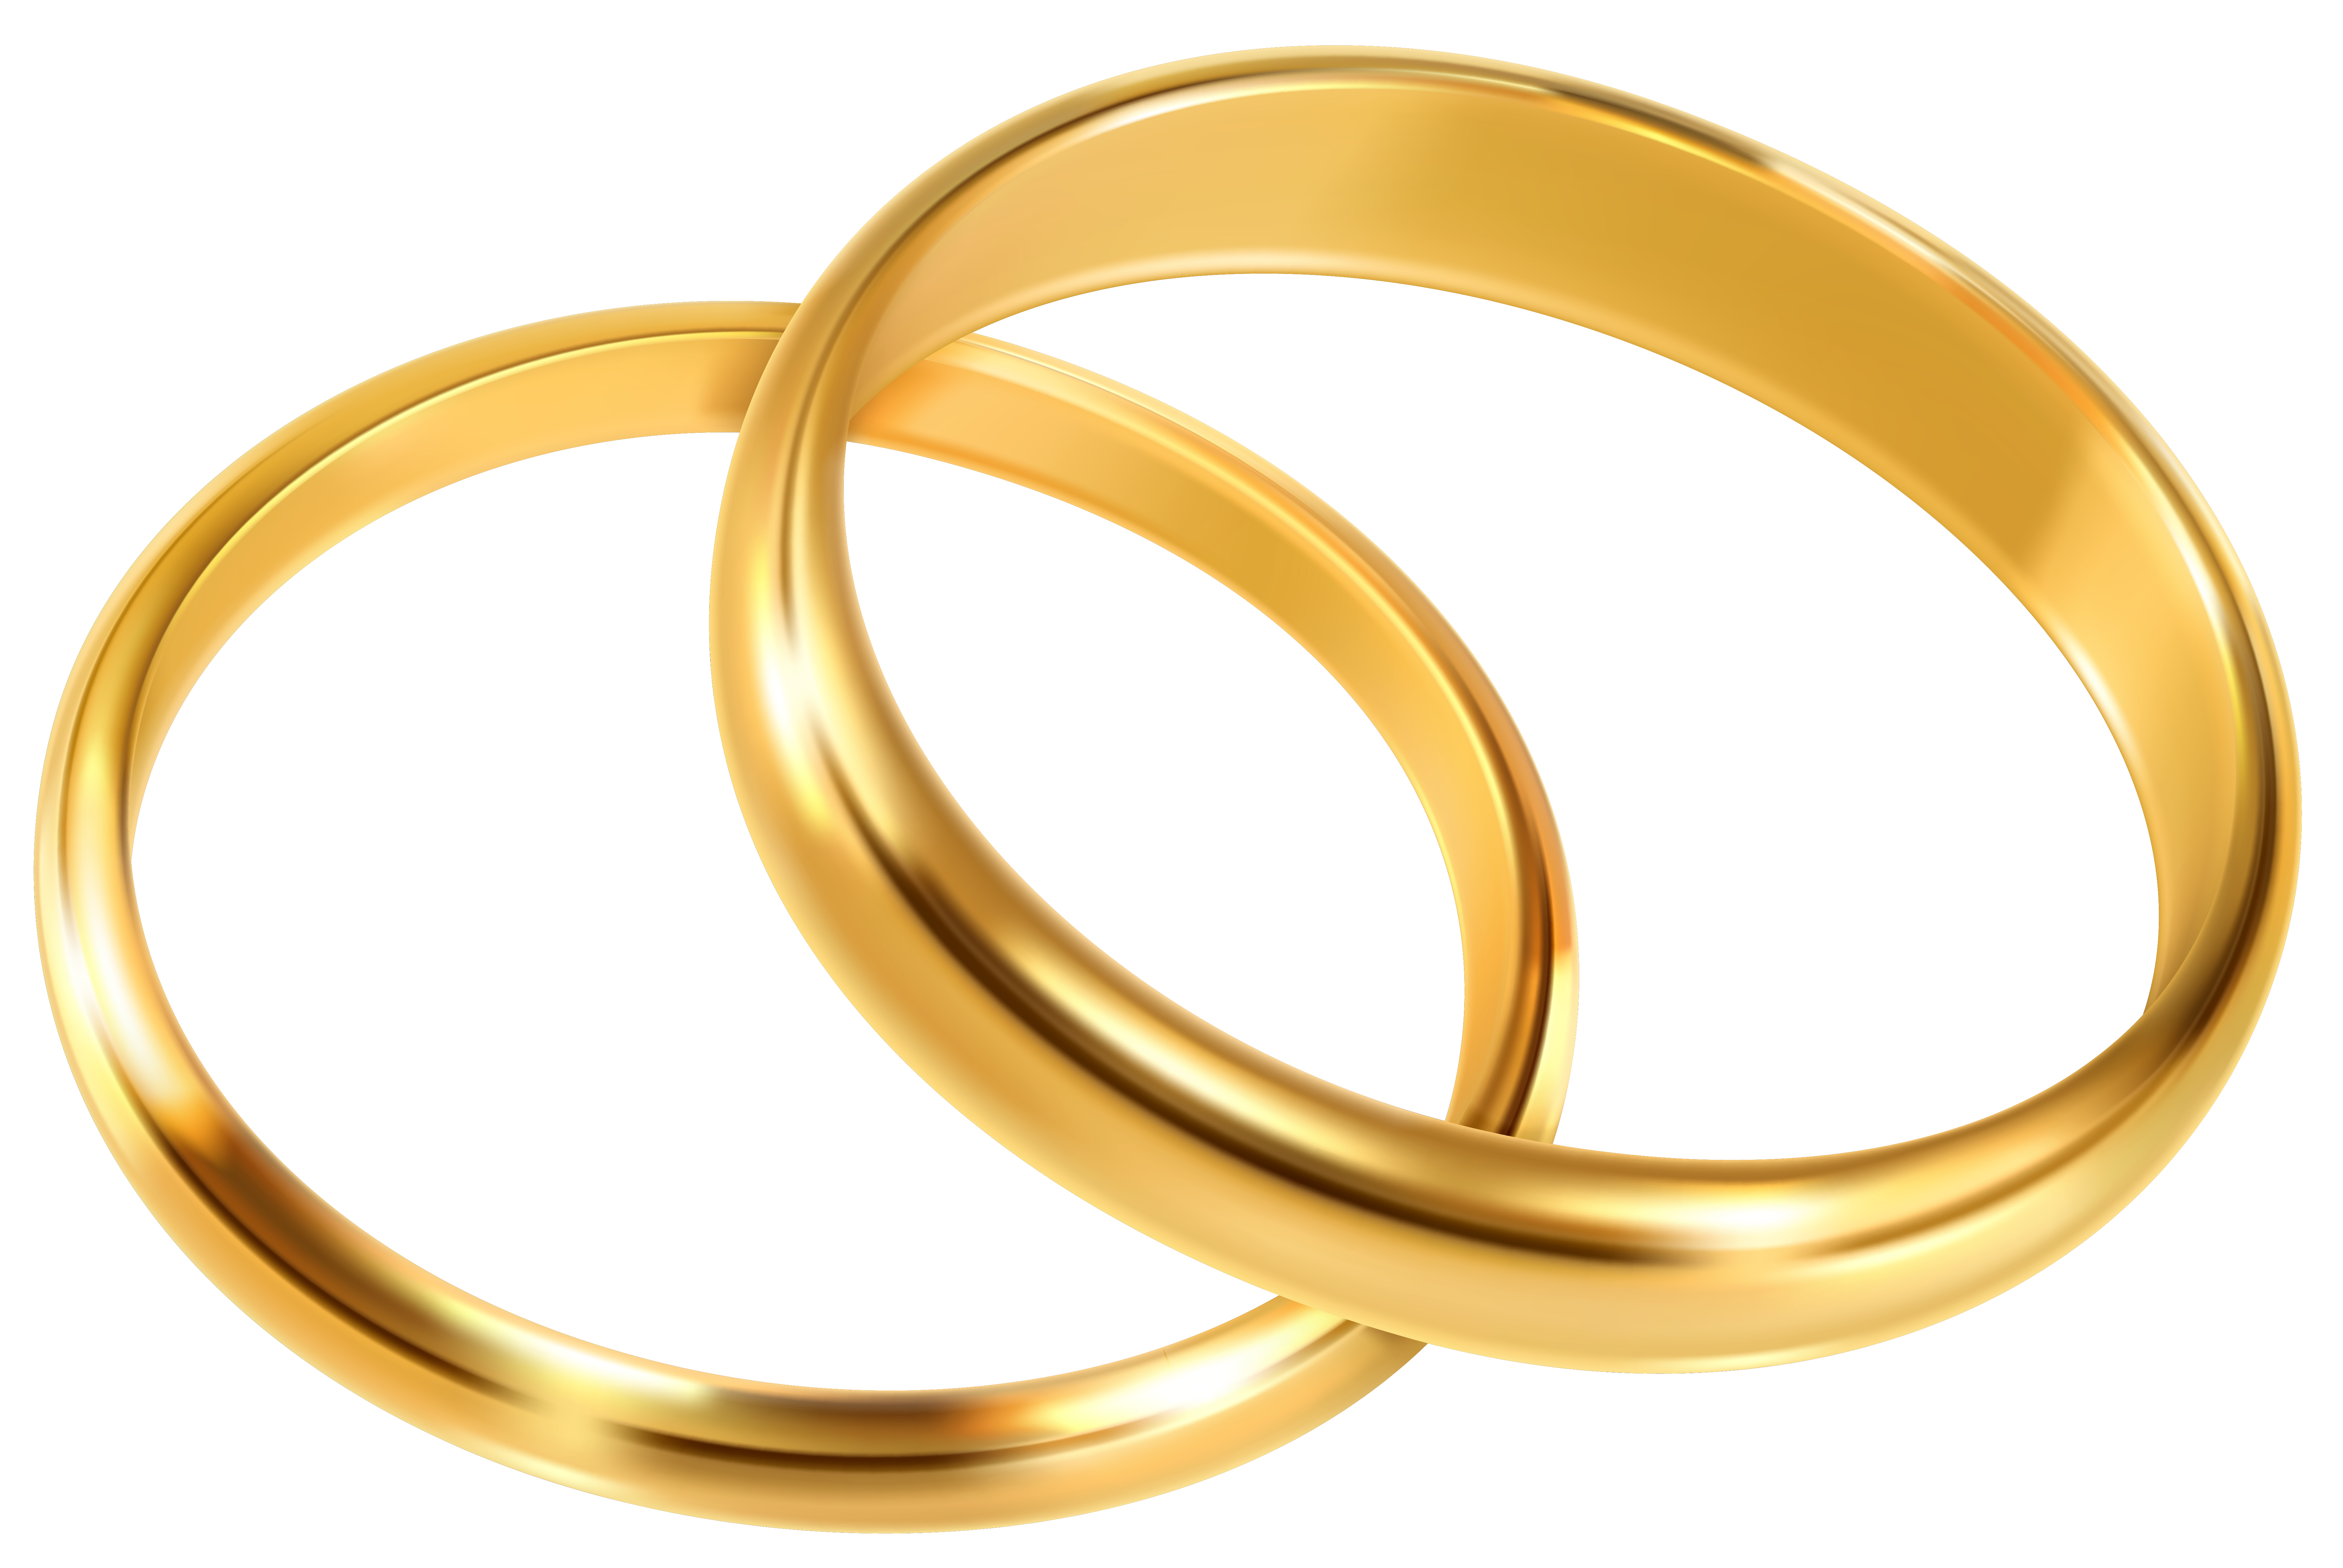 Wedding, Wedding Ring, Marriage png